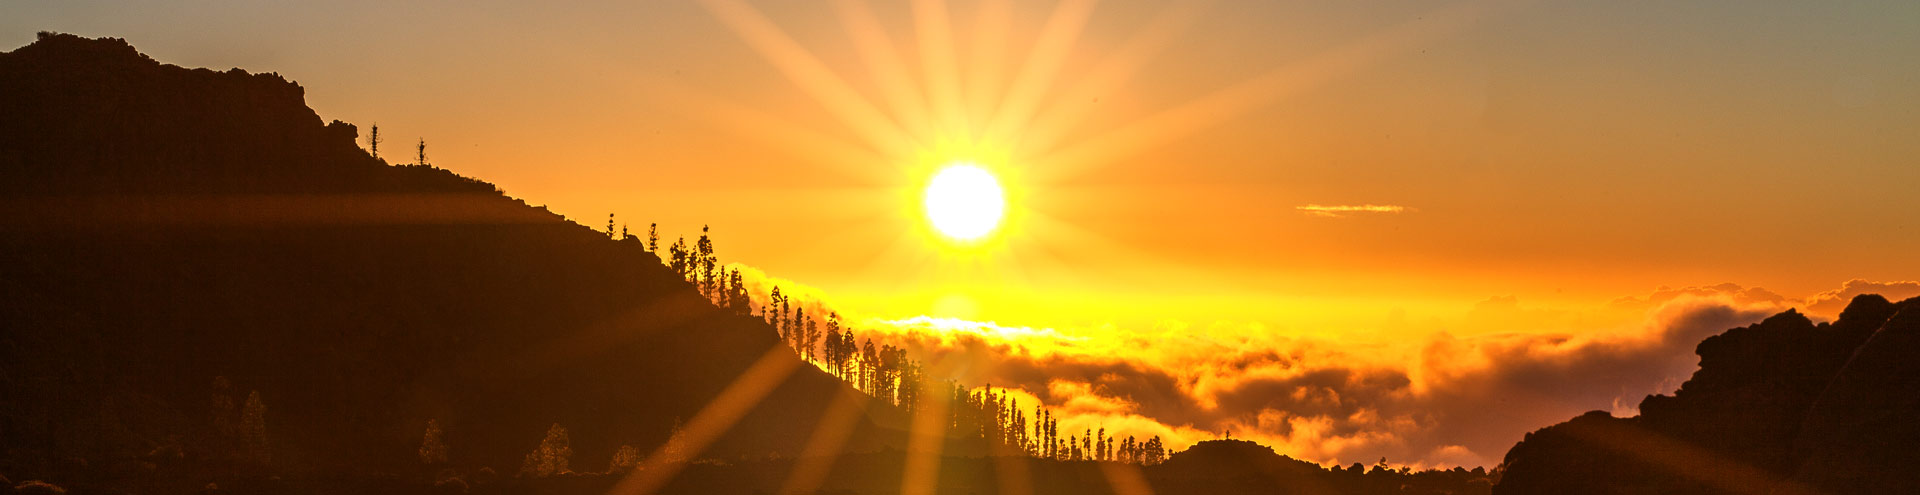 Sunset from the caldera of Teide volcano